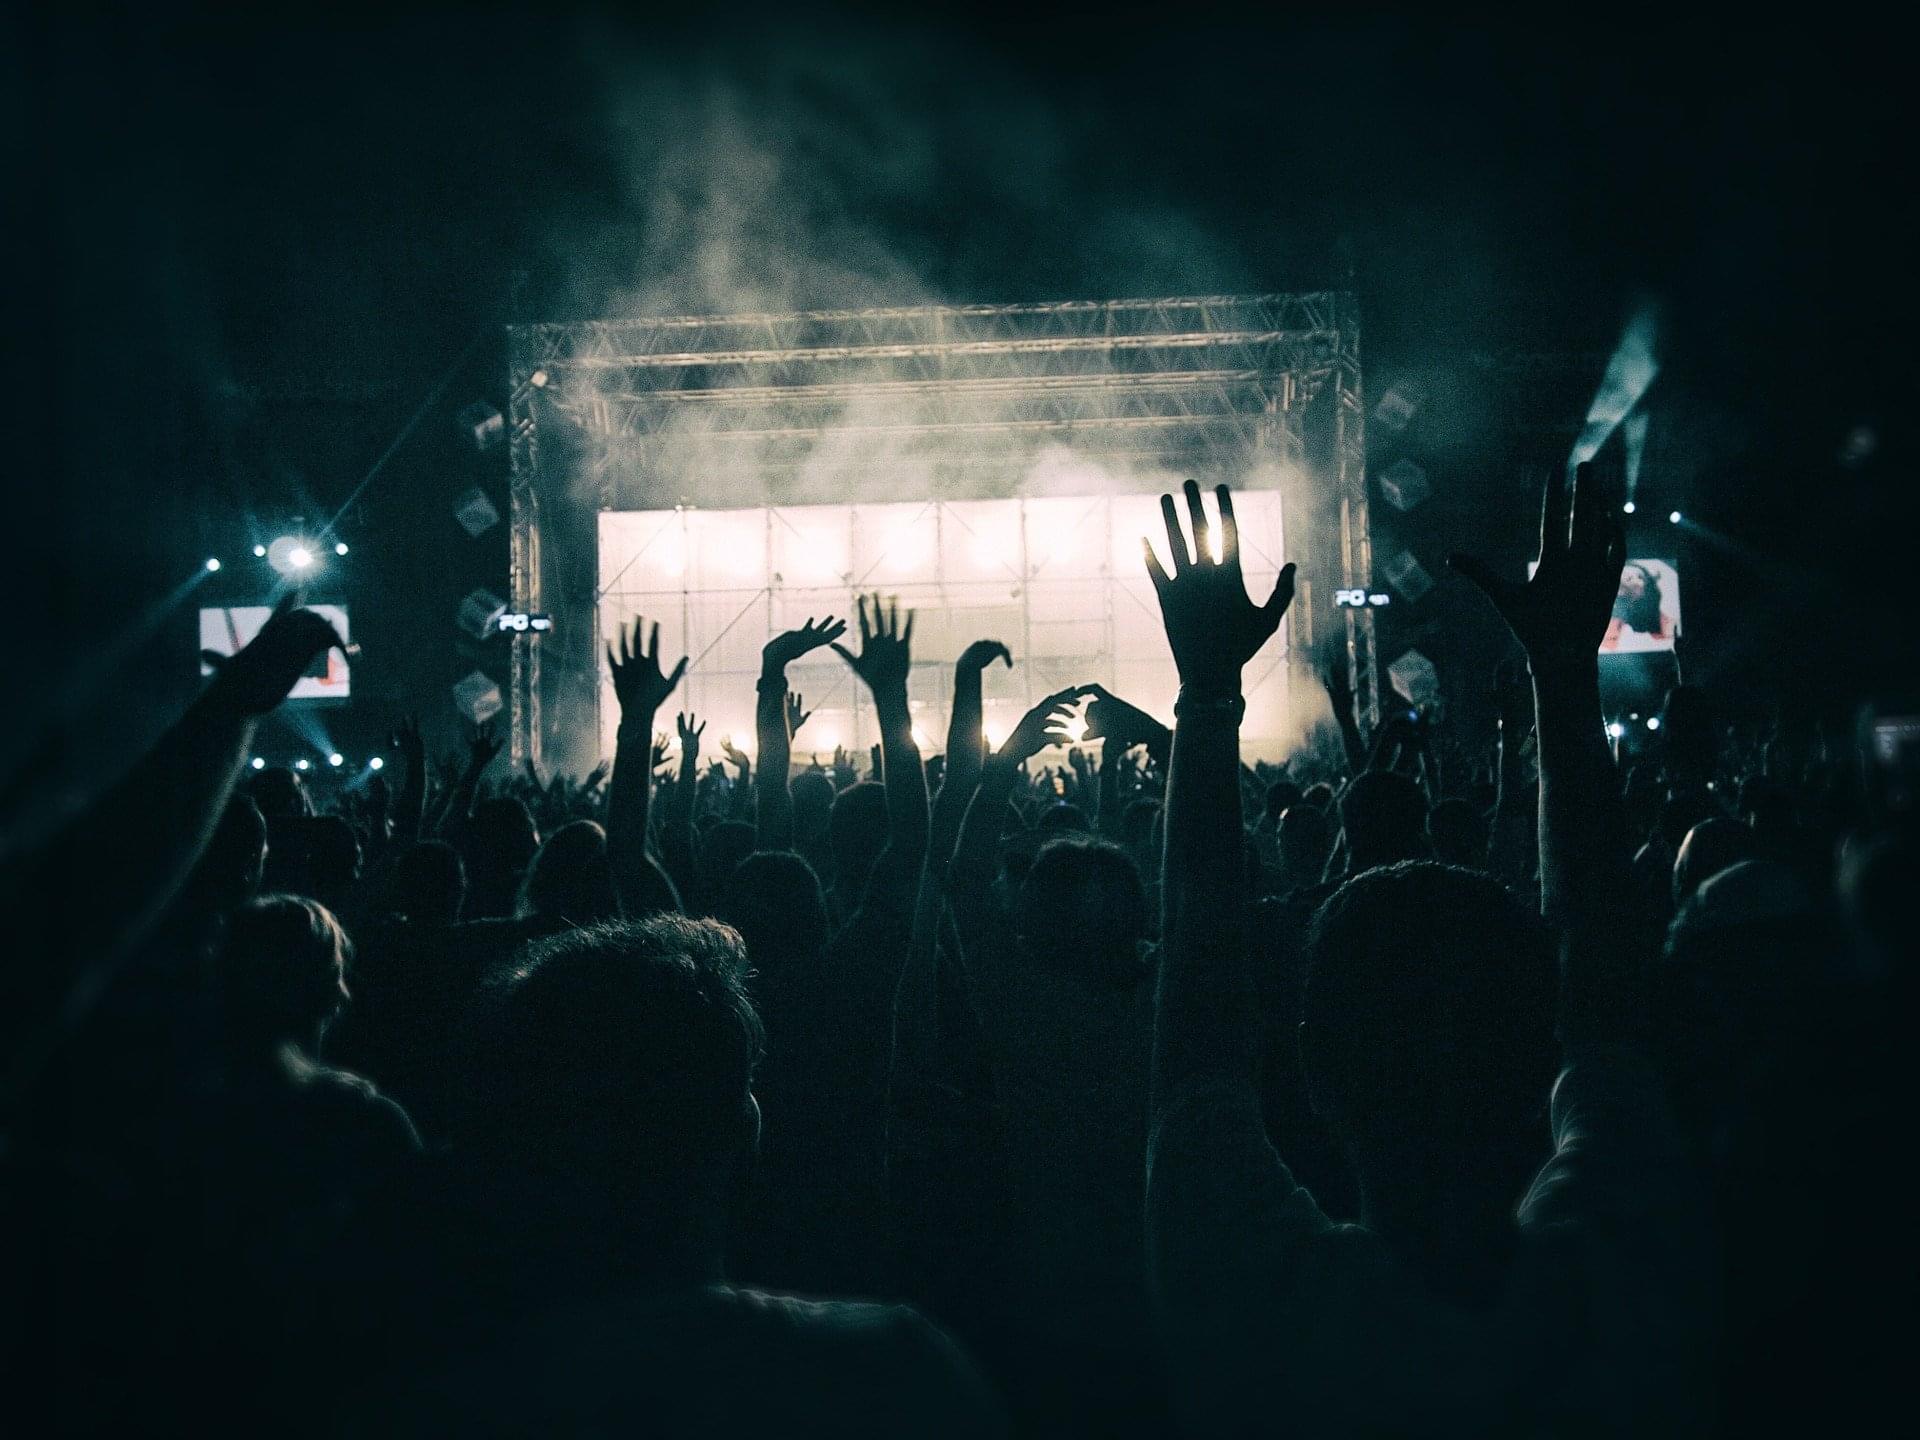 crowd-1056764_1920 (2)